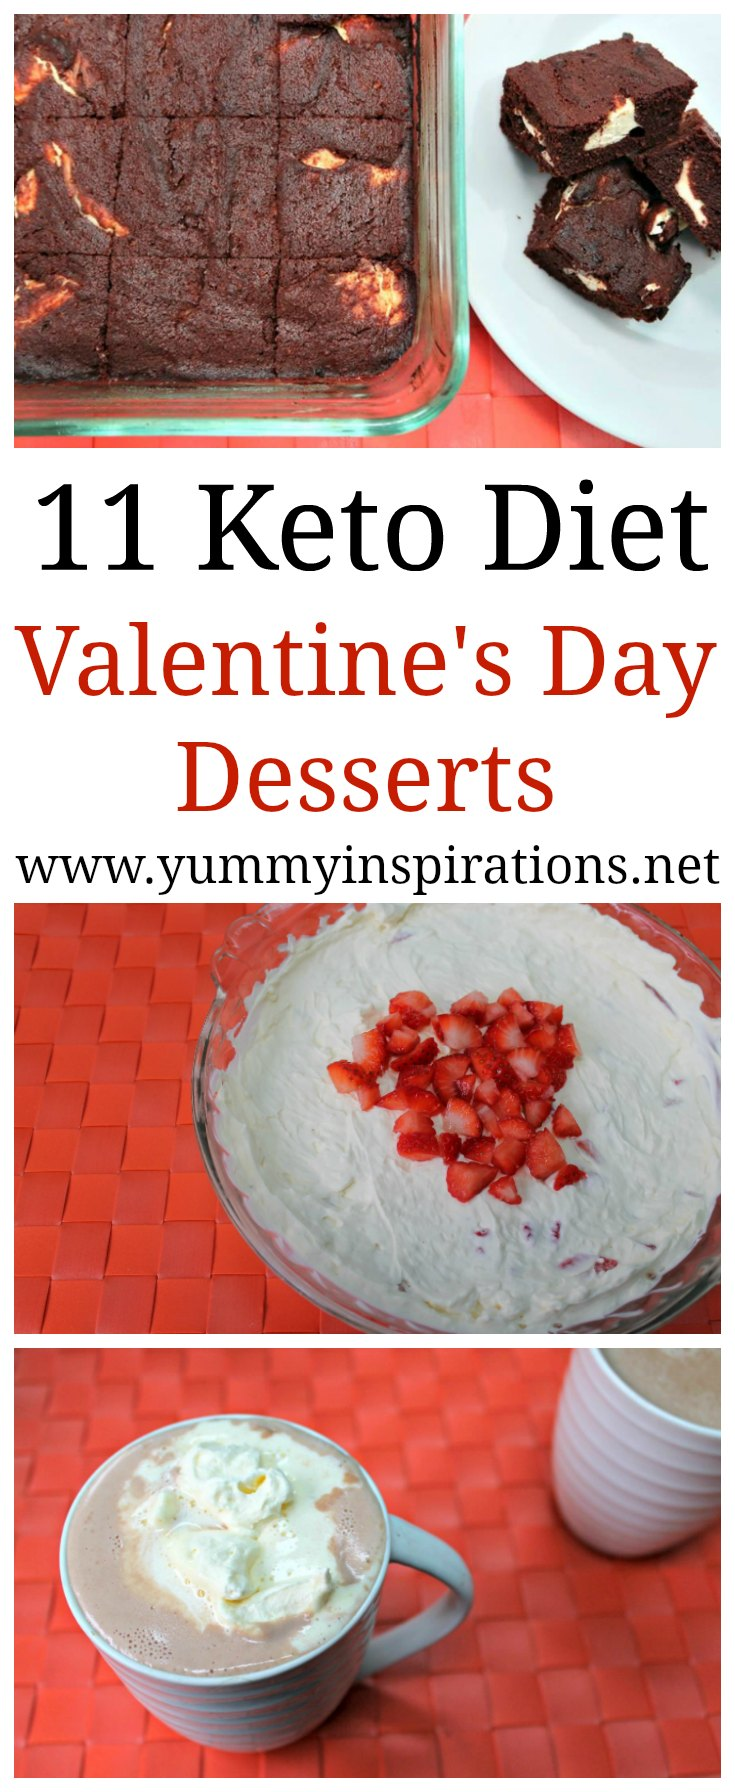 11 Keto Valentines Dessert Ideas Easy Low Carb Ketogenic Treats